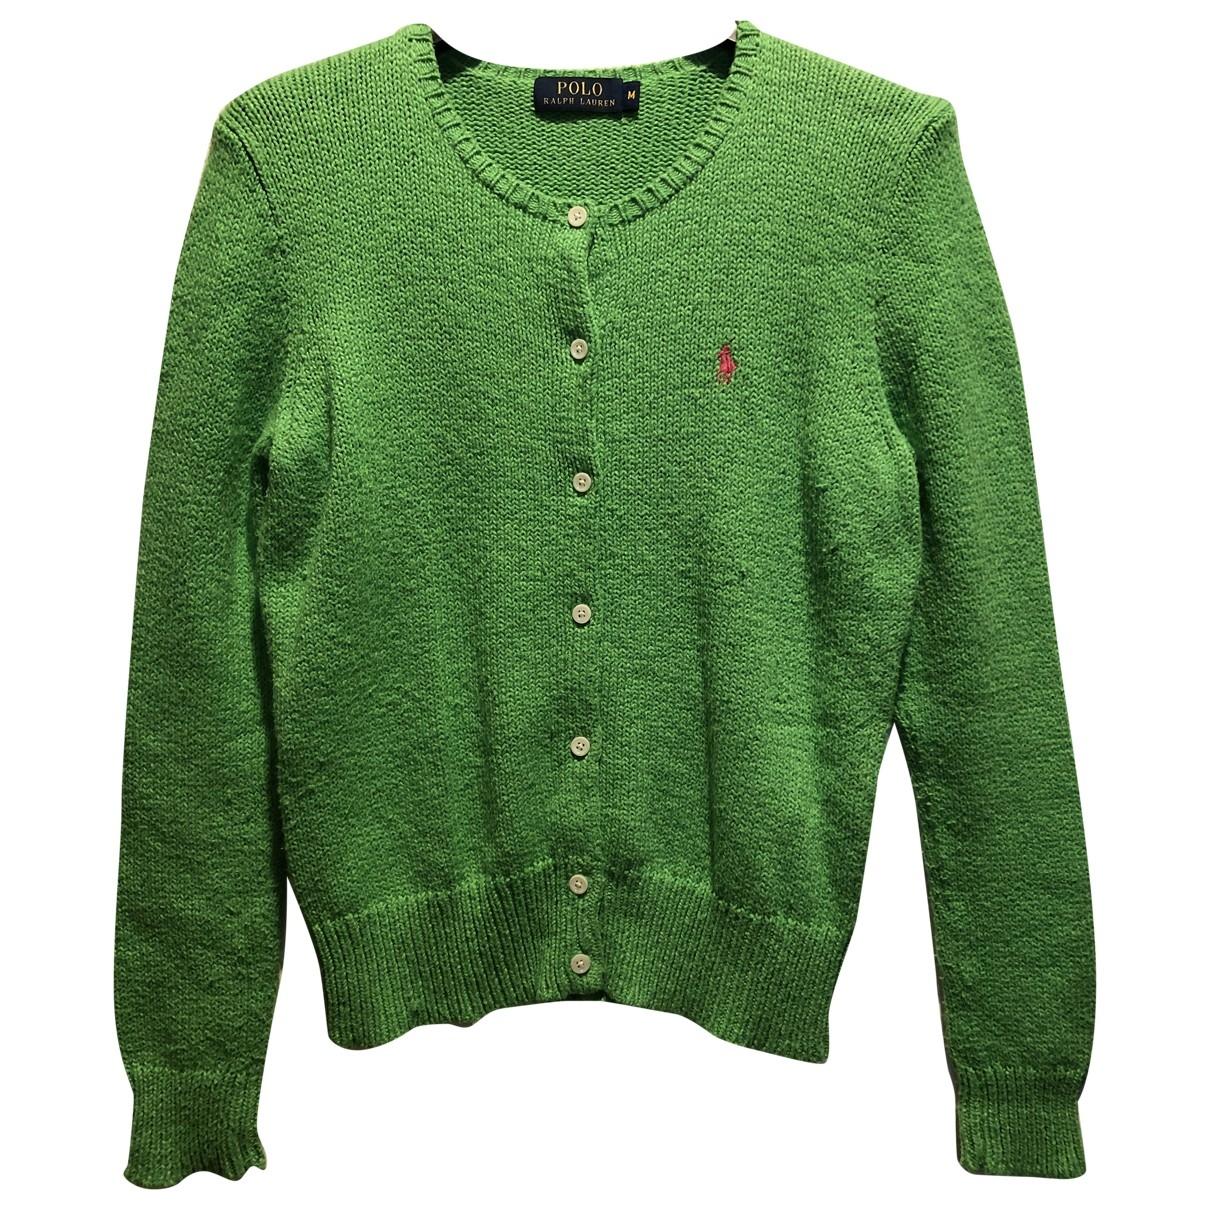 Polo Ralph Lauren \N Green Cotton Knitwear for Women M International